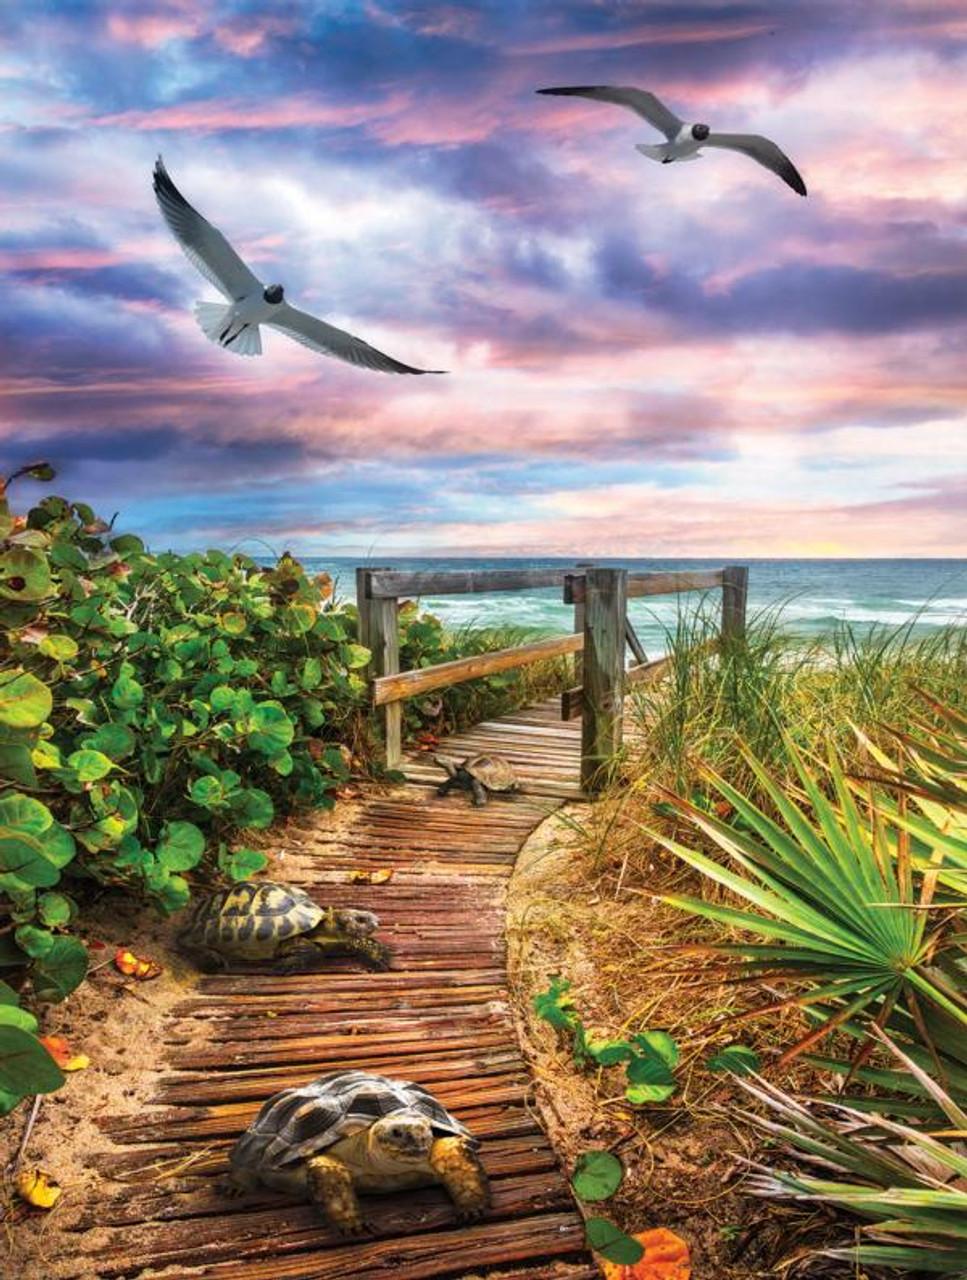 SUNSOUT INC Beach Life 500 pc Jigsaw Puzzle